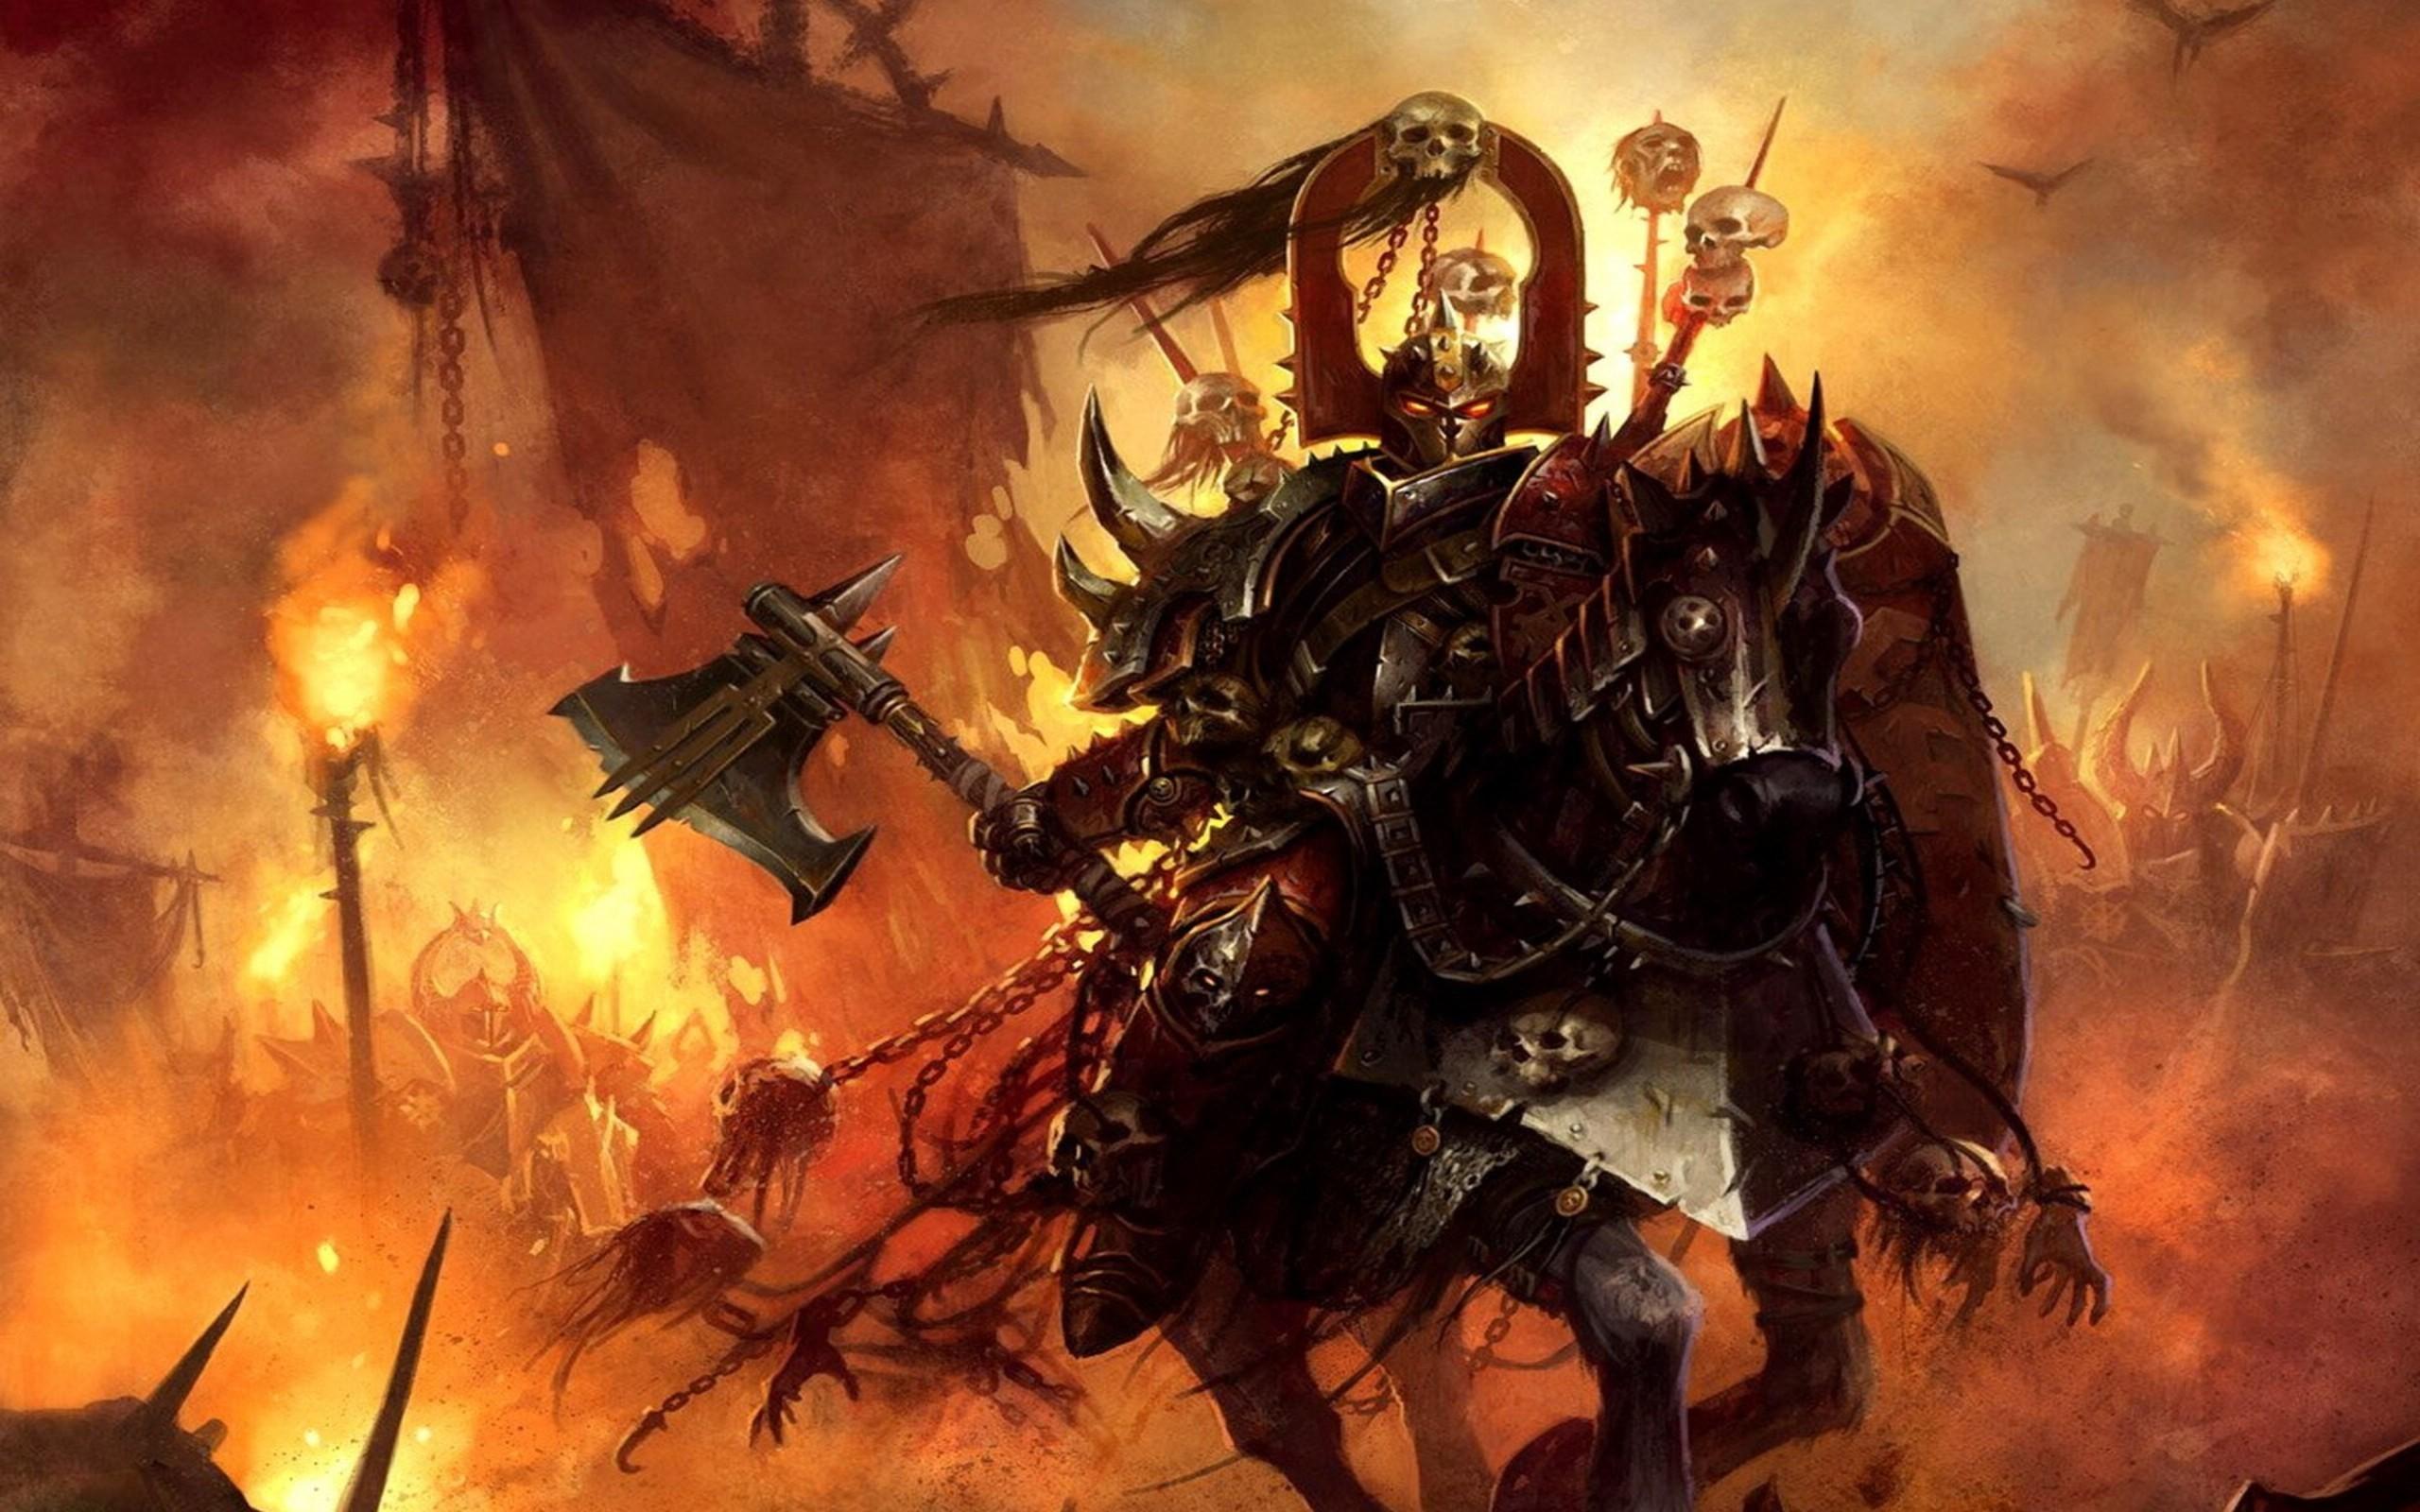 hd wallpaper warhammer online age of reckoning, Wentworth London 2017-03-25